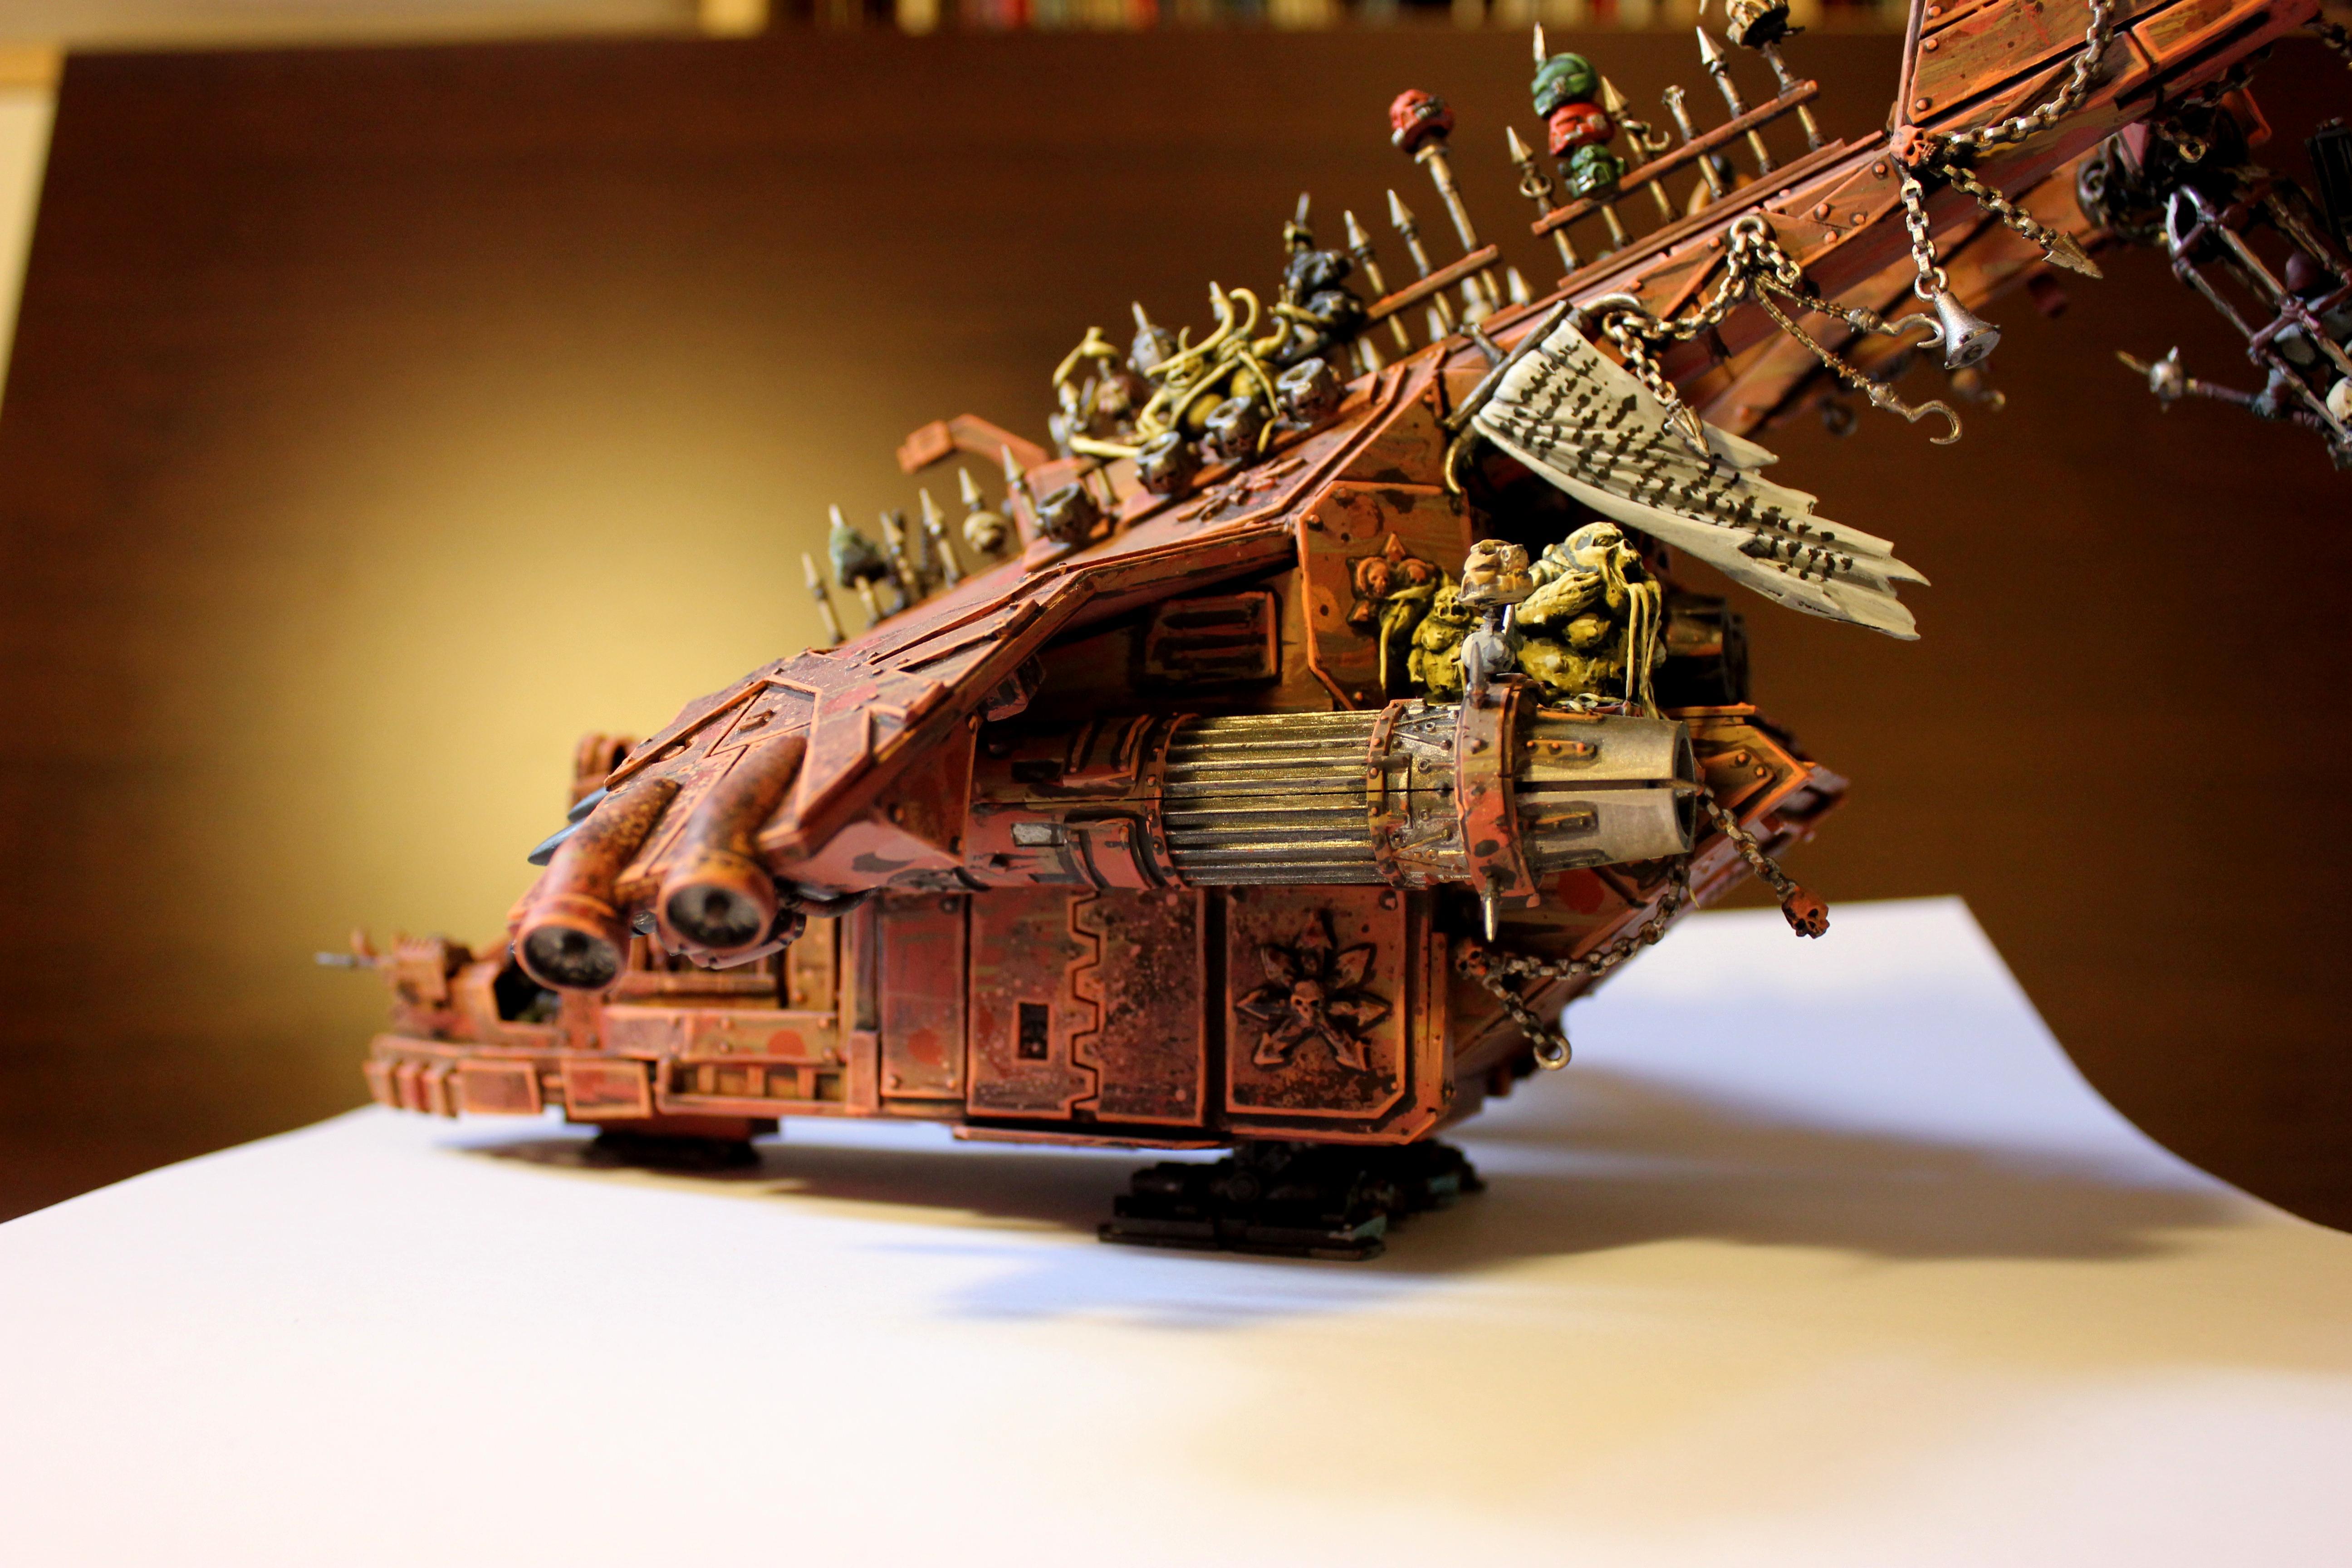 Air, Bomber, Chaos Flyer, Chaos Space Marines, Conversion, Höllendrache, Havocs, Helldrake, Jet, Kyborks, Nurgle, Slaanesh, Umbau, Warhammer 40,000